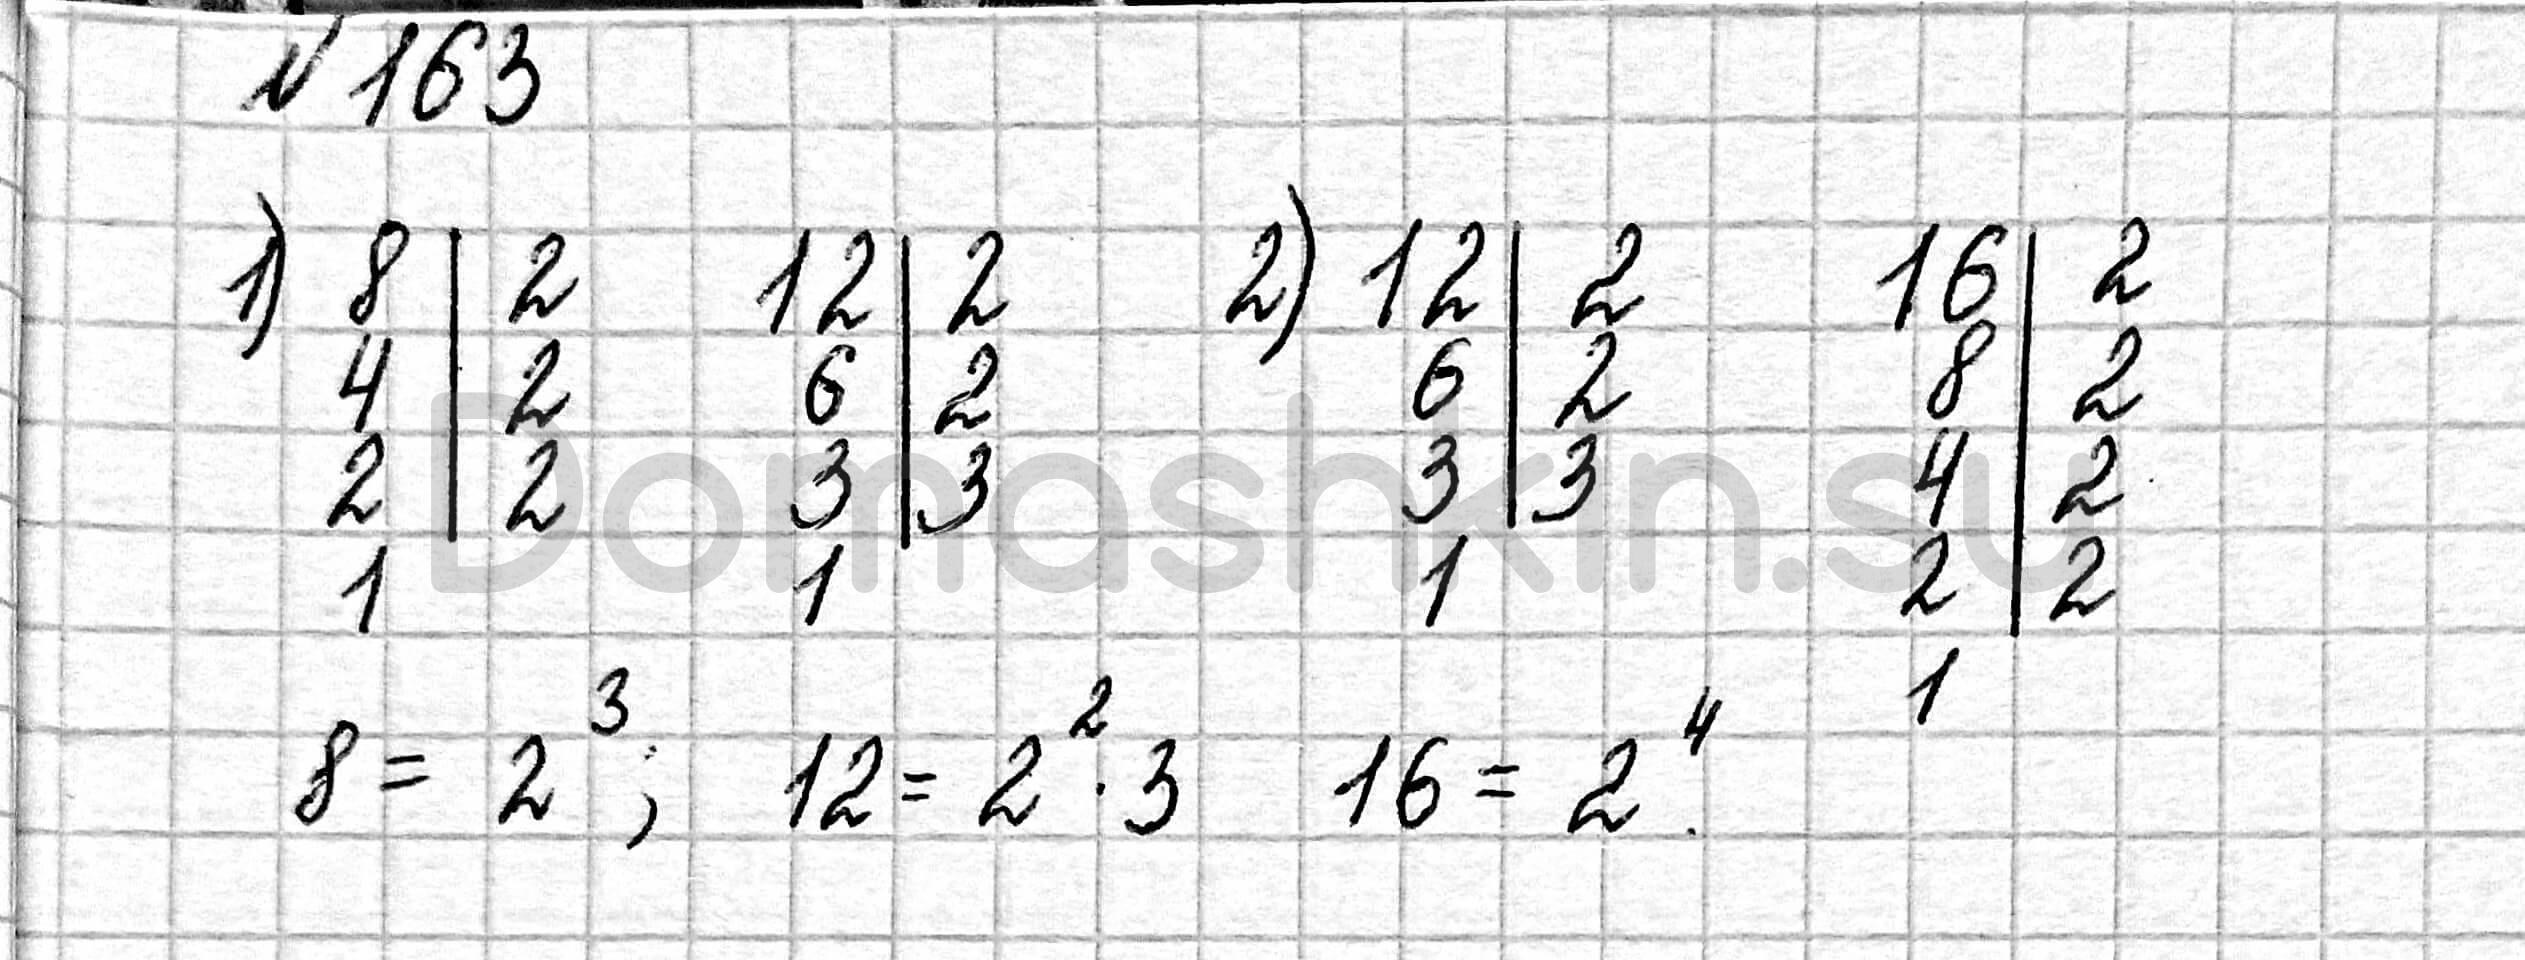 Математика 6 класс учебник Мерзляк номер 163 решение